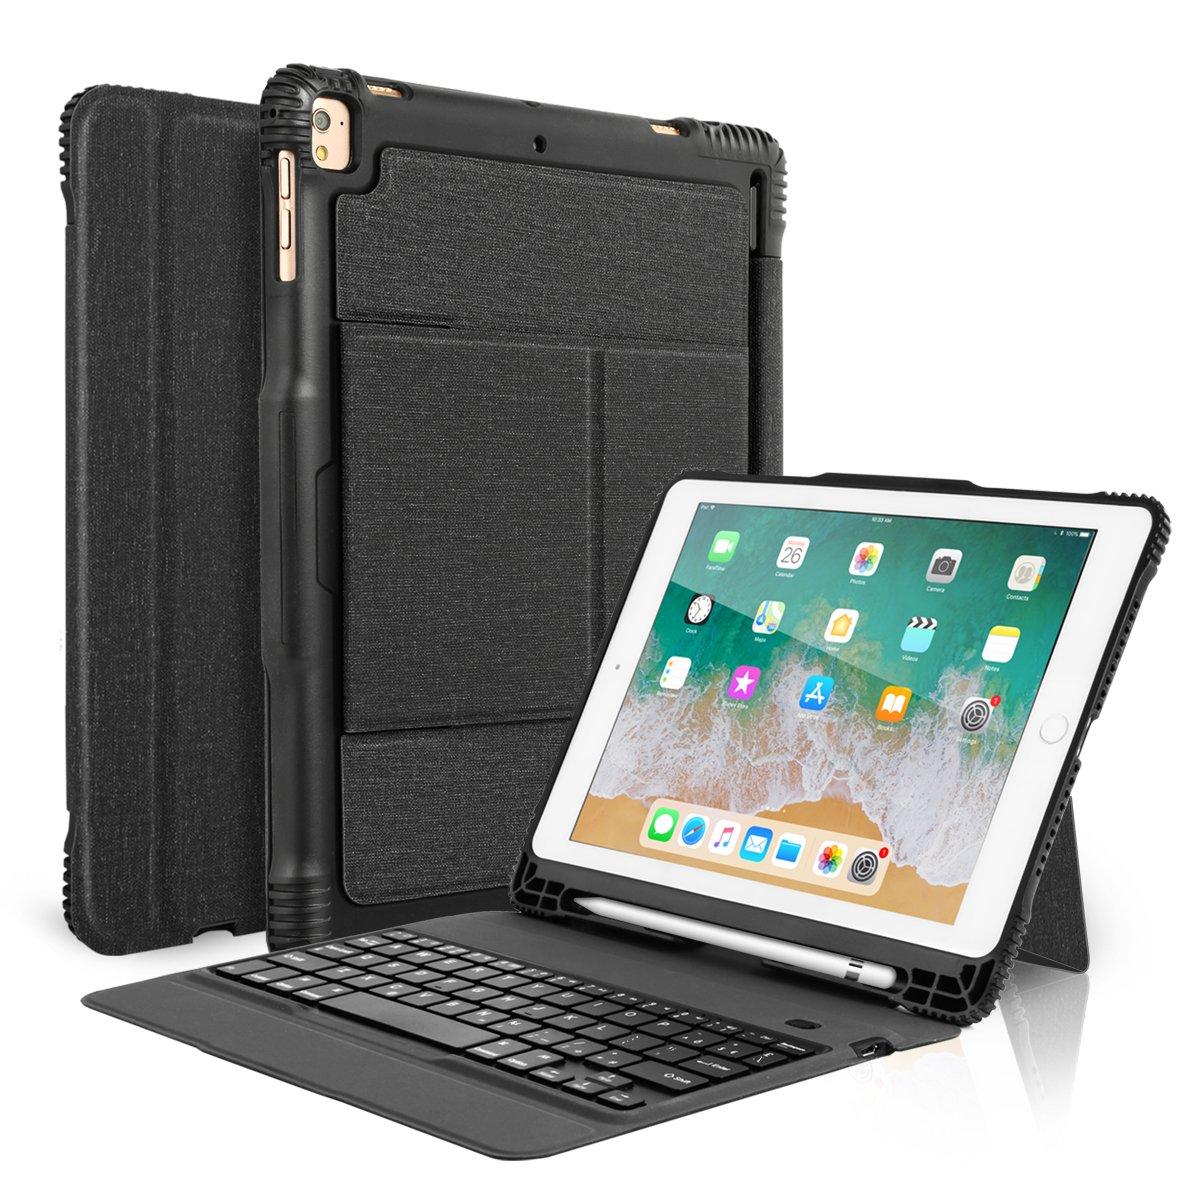 CoastaCloud New 2018 iPad 9.7 Keyboard Case with Pencil Holder, Detachable Bluetooth Keyboard with Shockproof Heavy Duty Full-Body Protective Case for iPad 9.7 2018/2017 / iPad Pro 9.7 / iPad Air